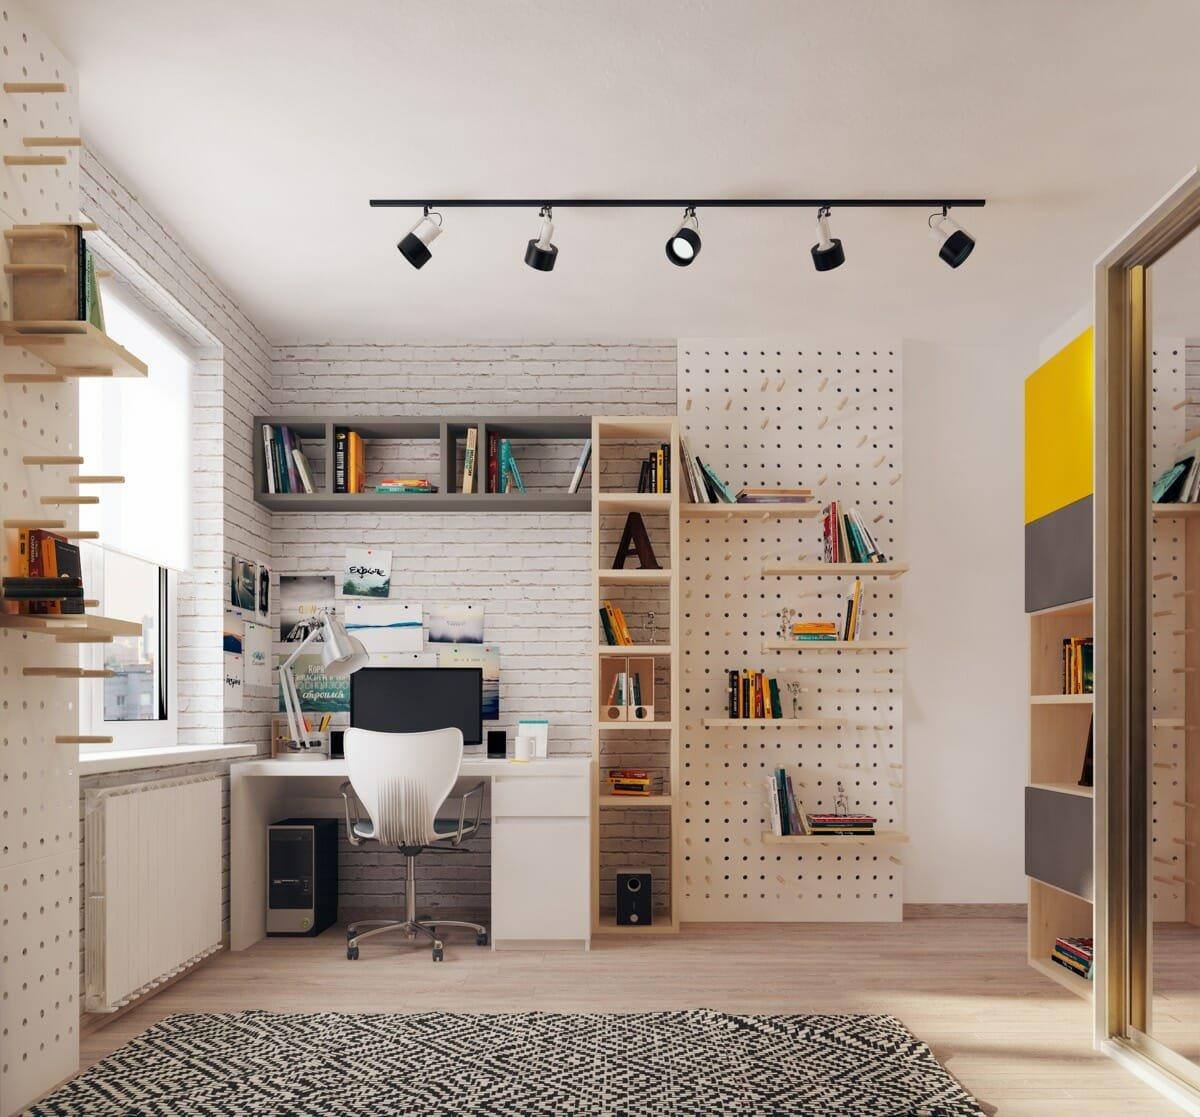 Modular study room ideas